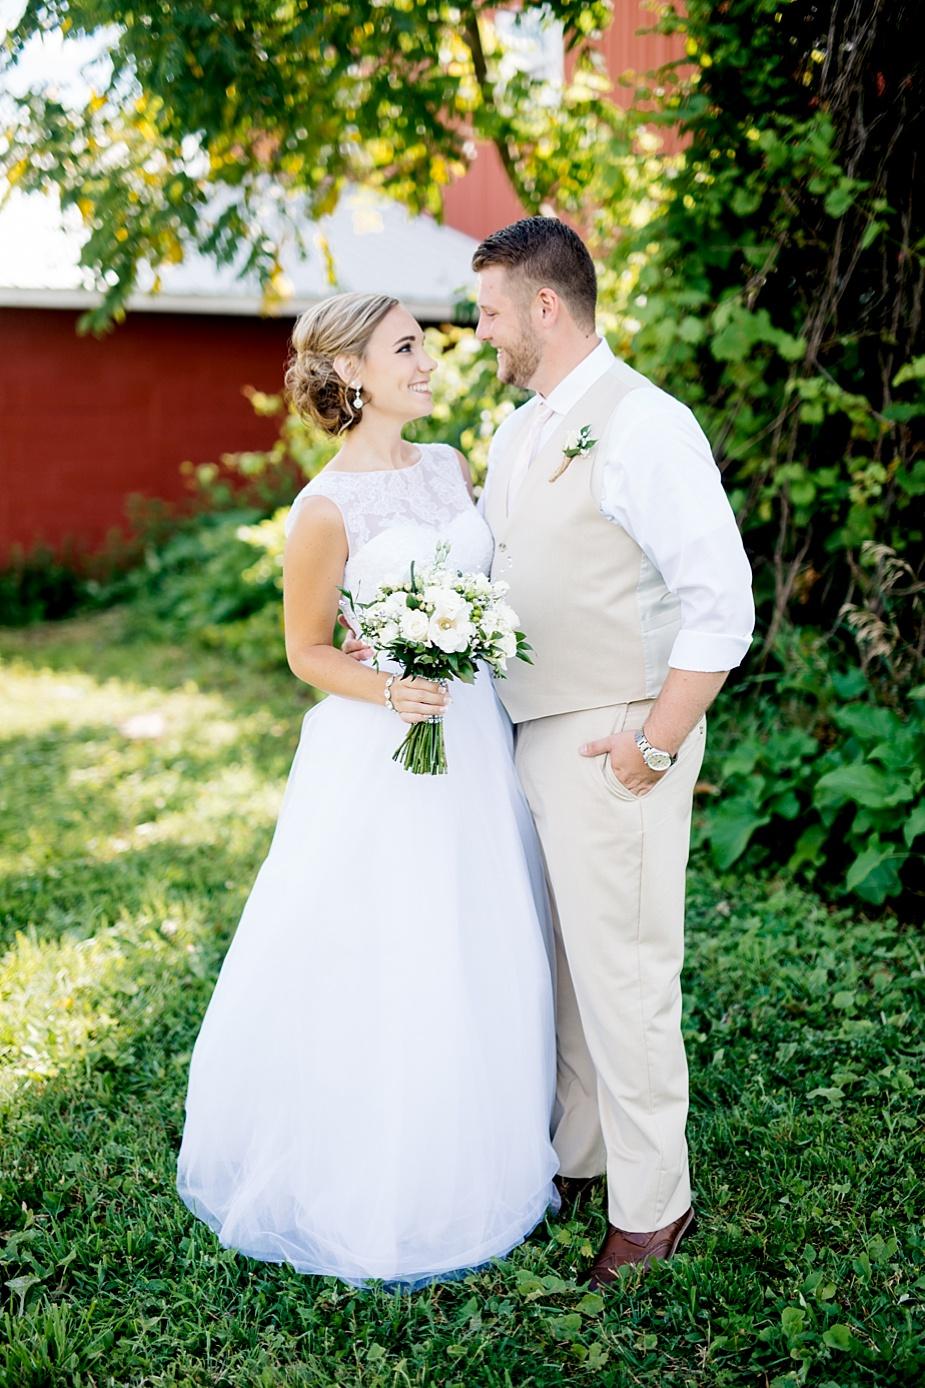 Taylor+Lauryn-Barn-Wedding-Milwaukee-Wedding-Photographer_0055.jpg